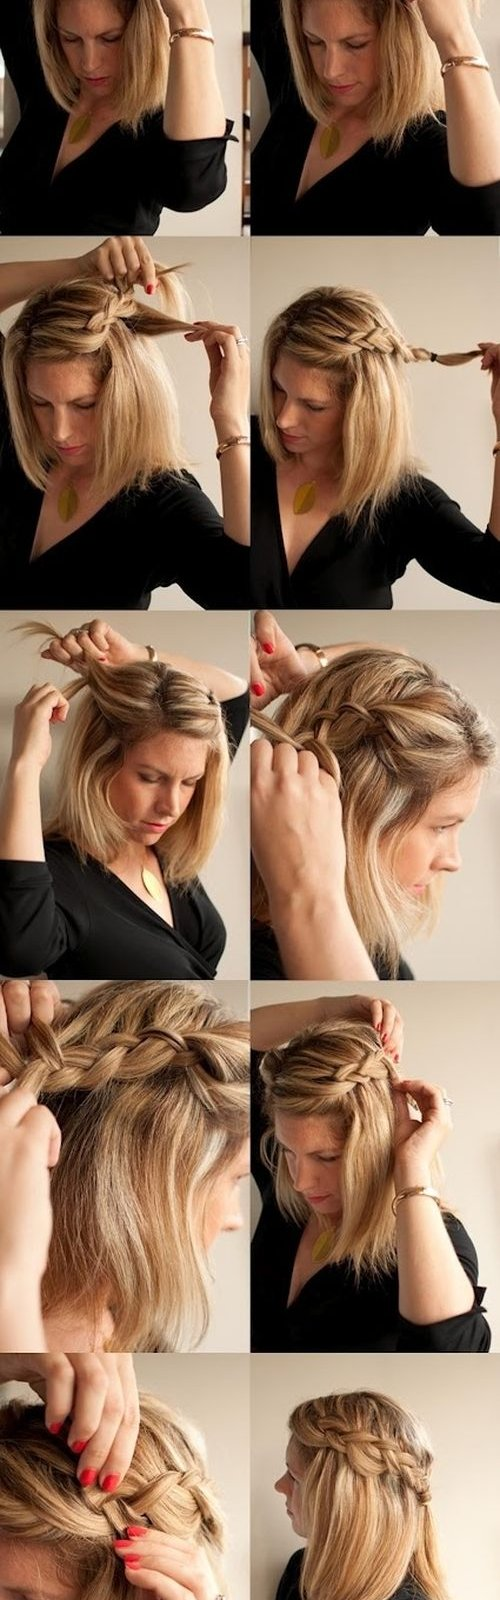 Прически косы на короткий волос в домашних условиях фото